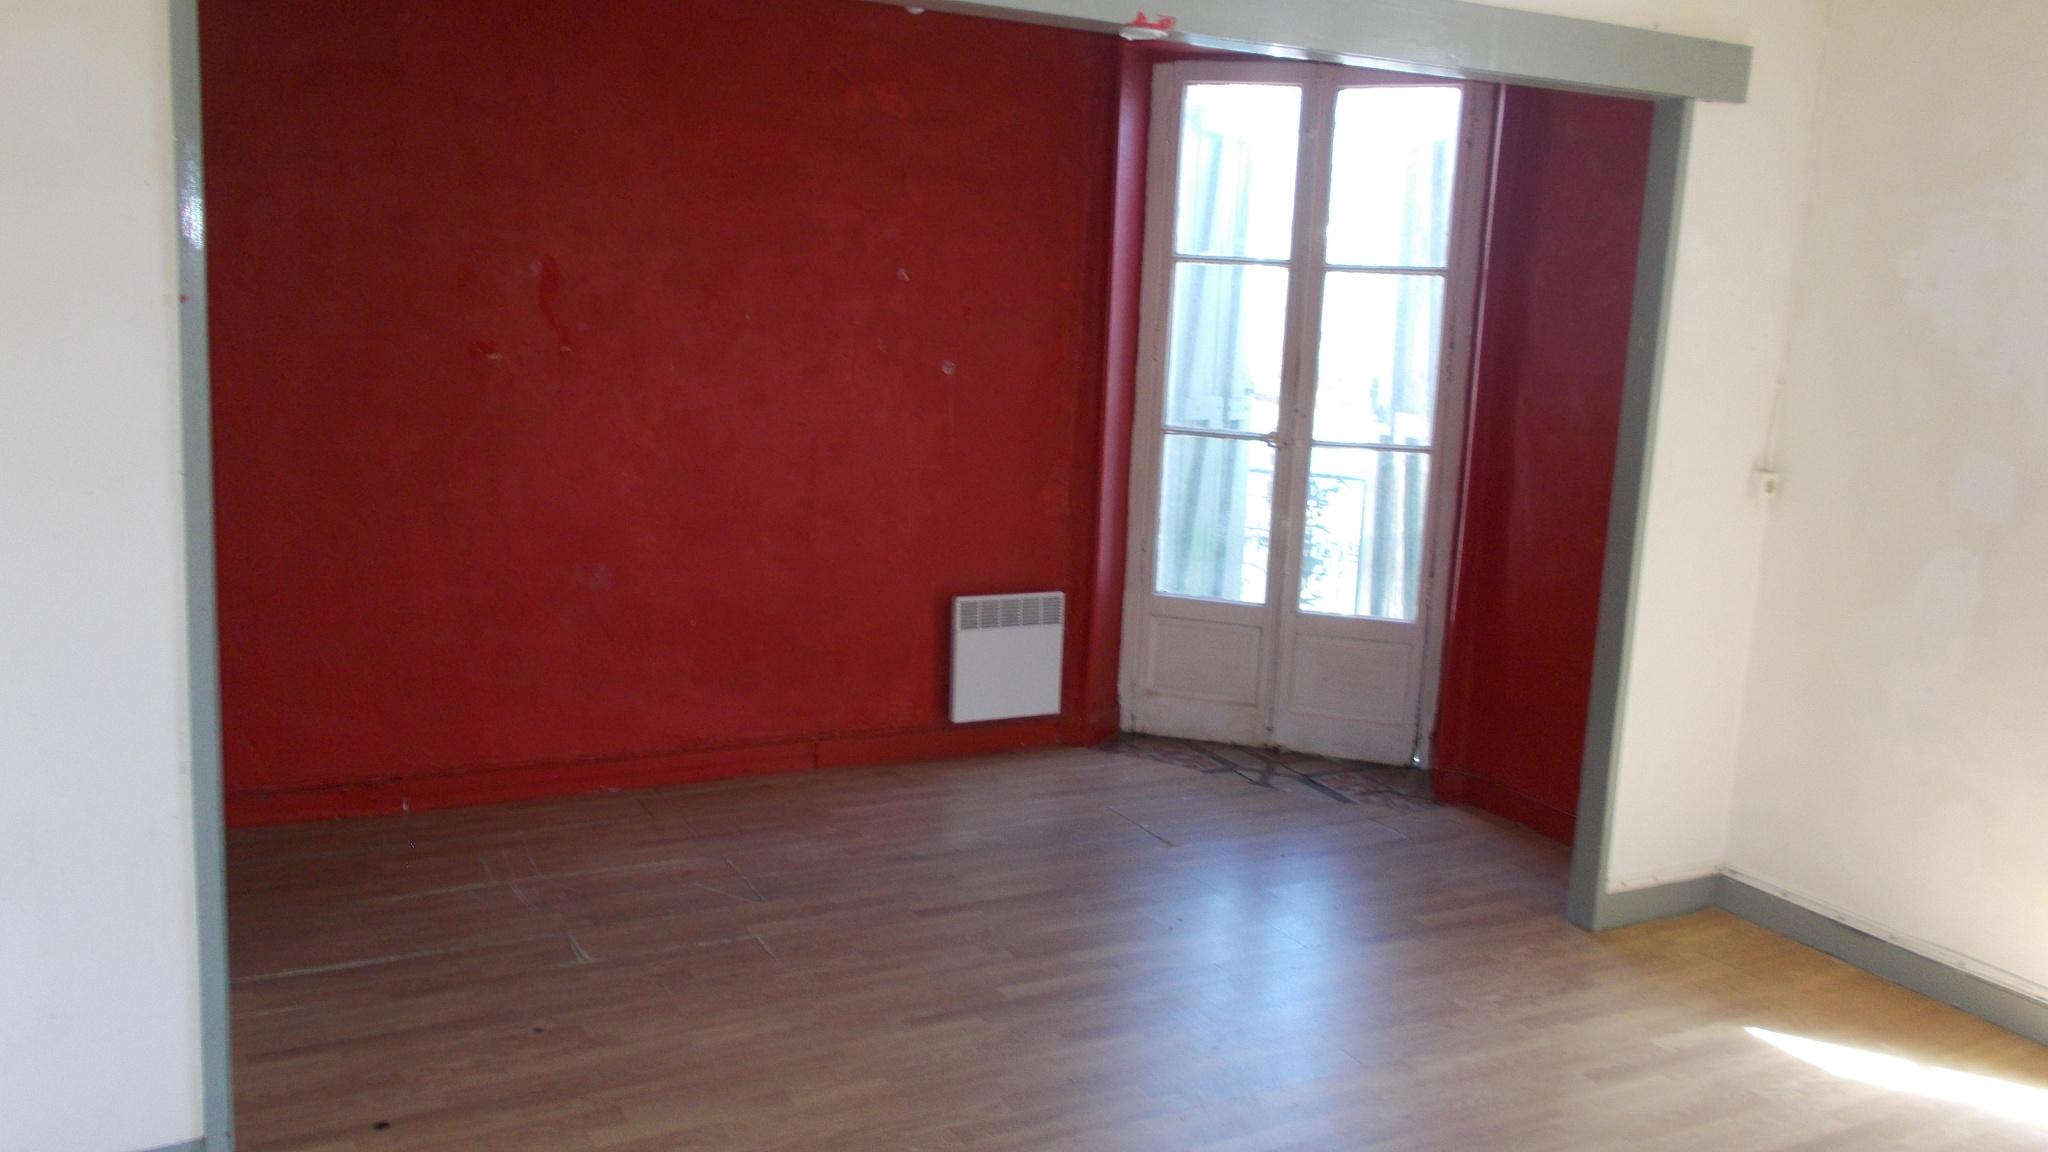 appartement deux chambres balcon rafraichir. Black Bedroom Furniture Sets. Home Design Ideas